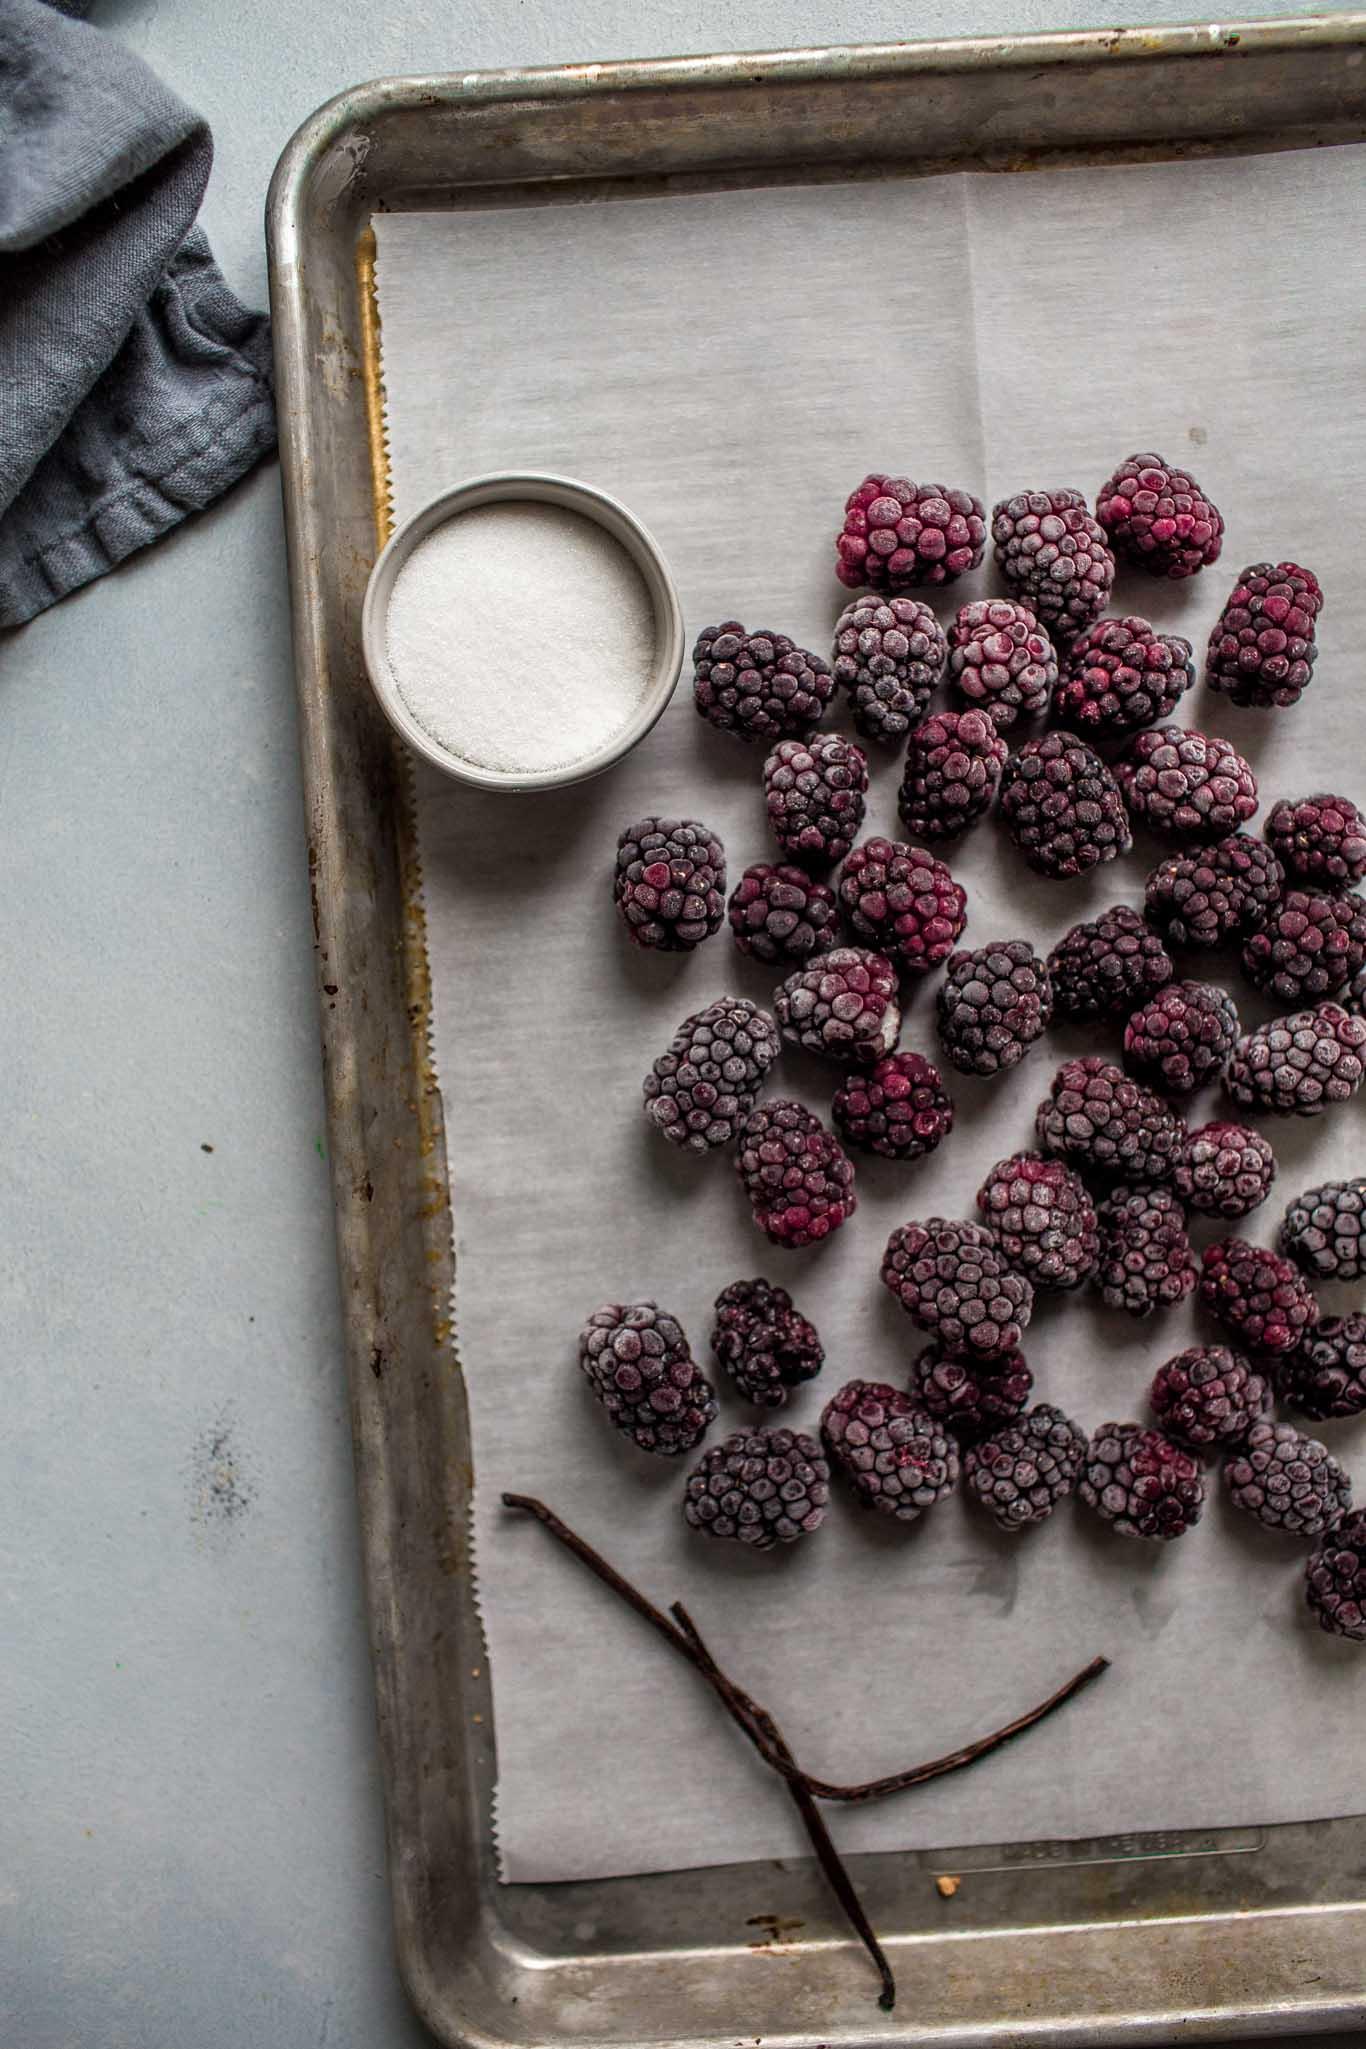 Frozen berries on baking sheet.